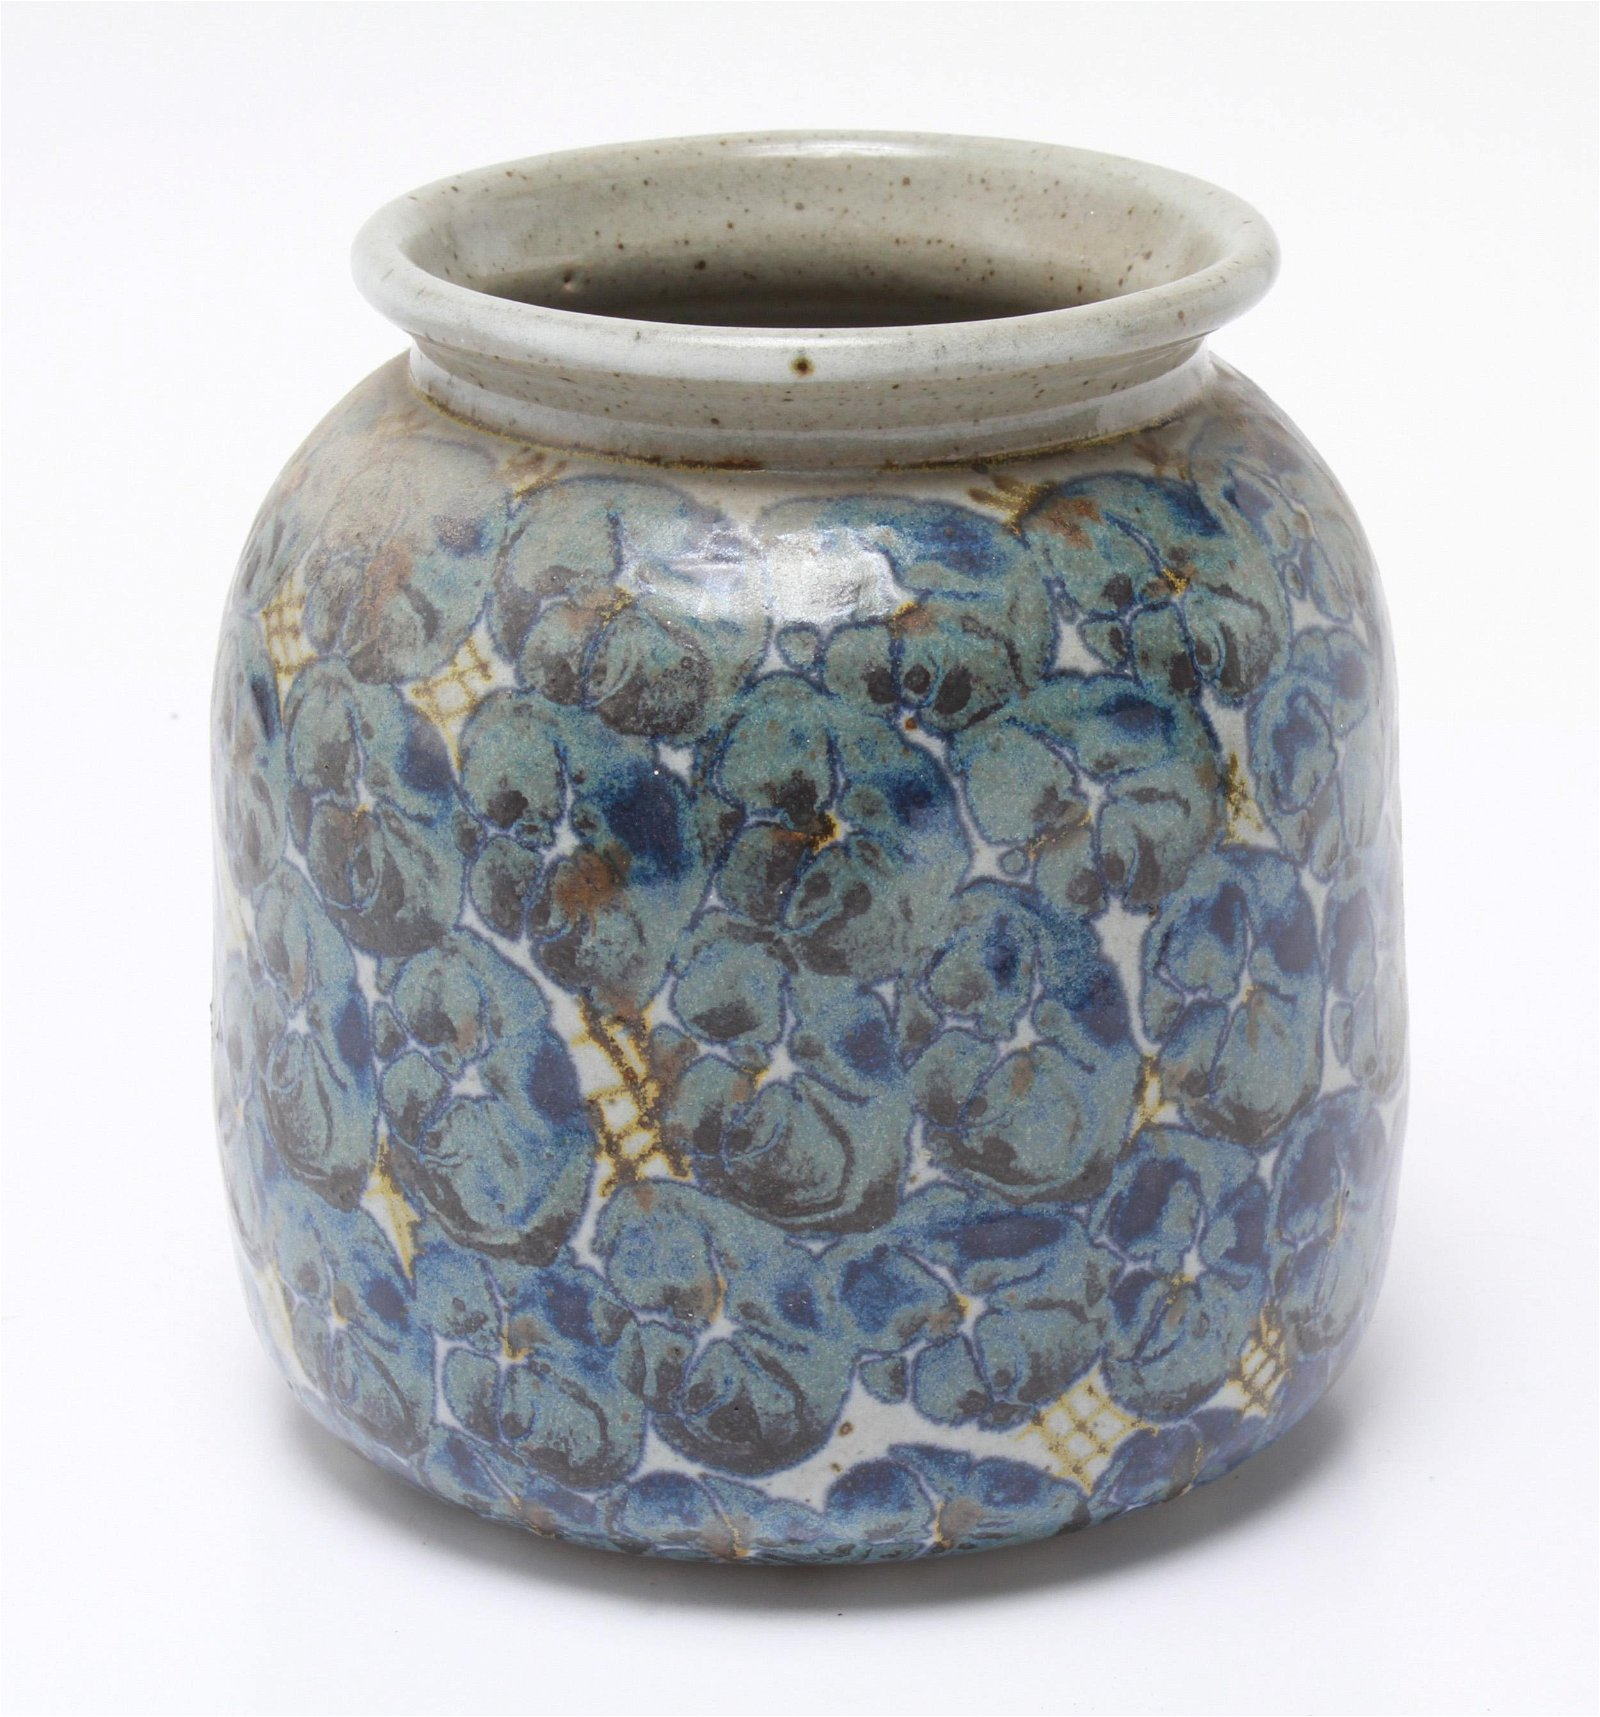 Illegibly Signed Art Studio Pottery Glazed Vase